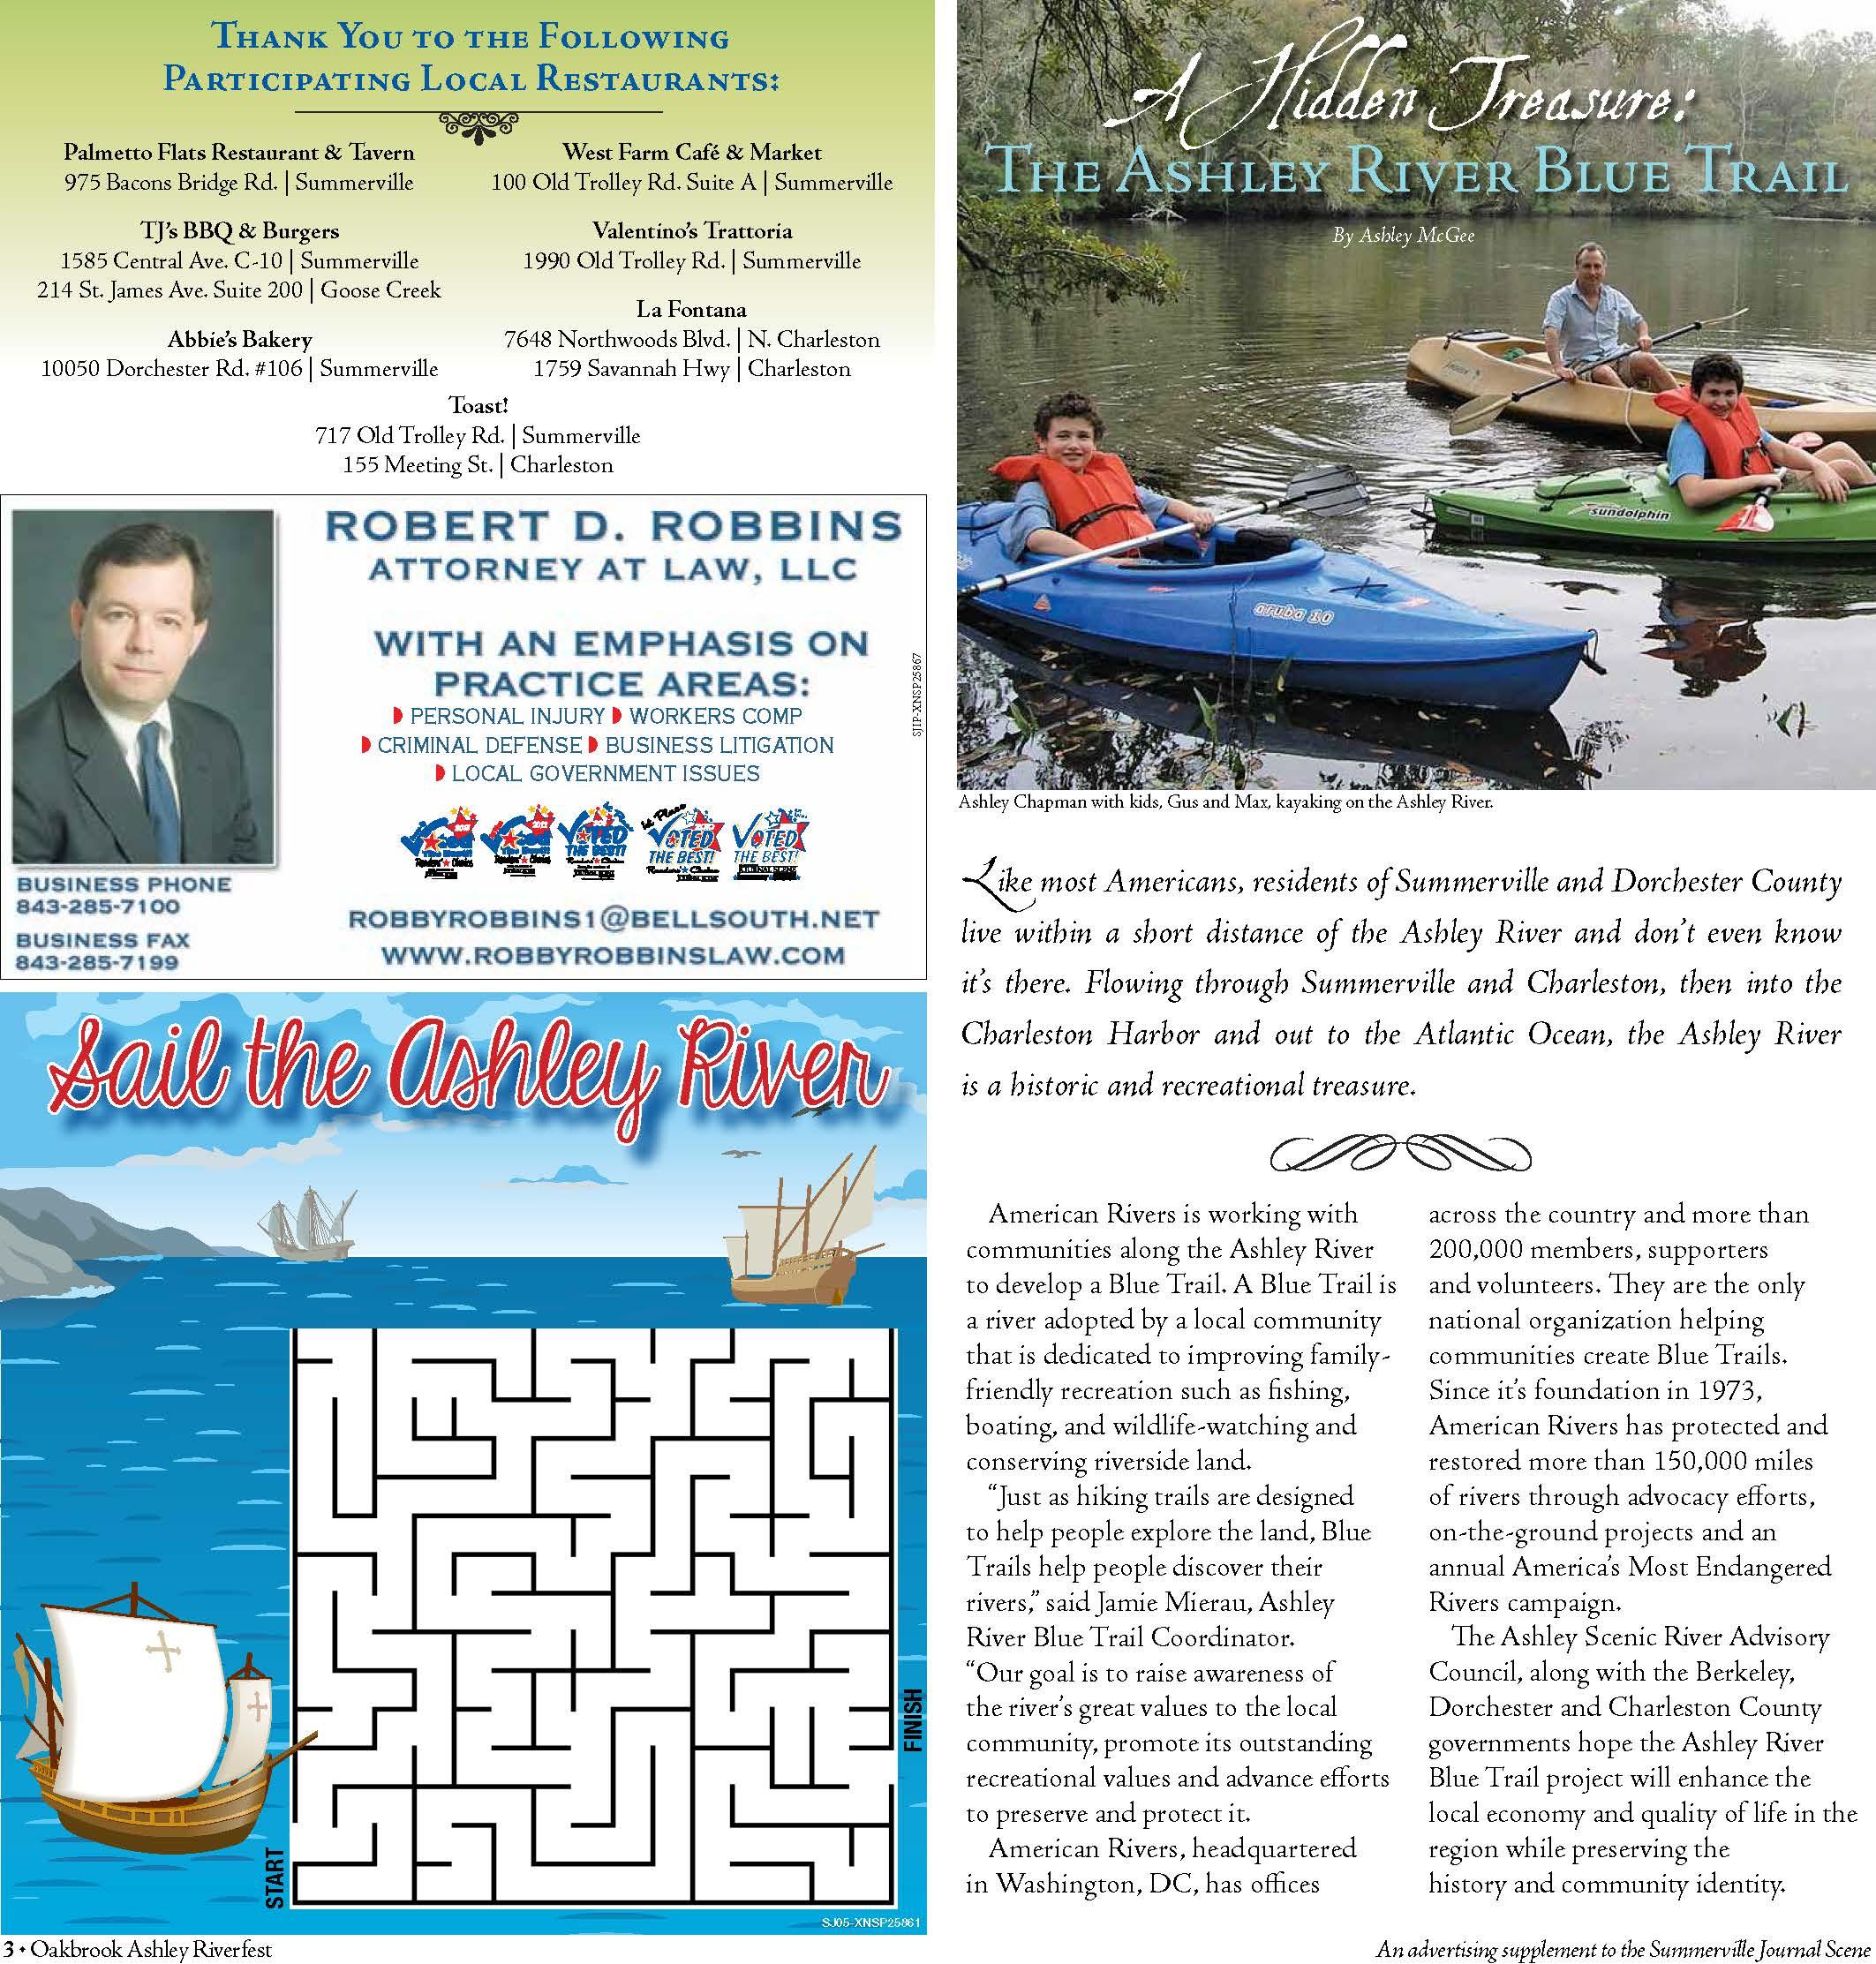 oakbrook-riverfest2_page_3.jpg